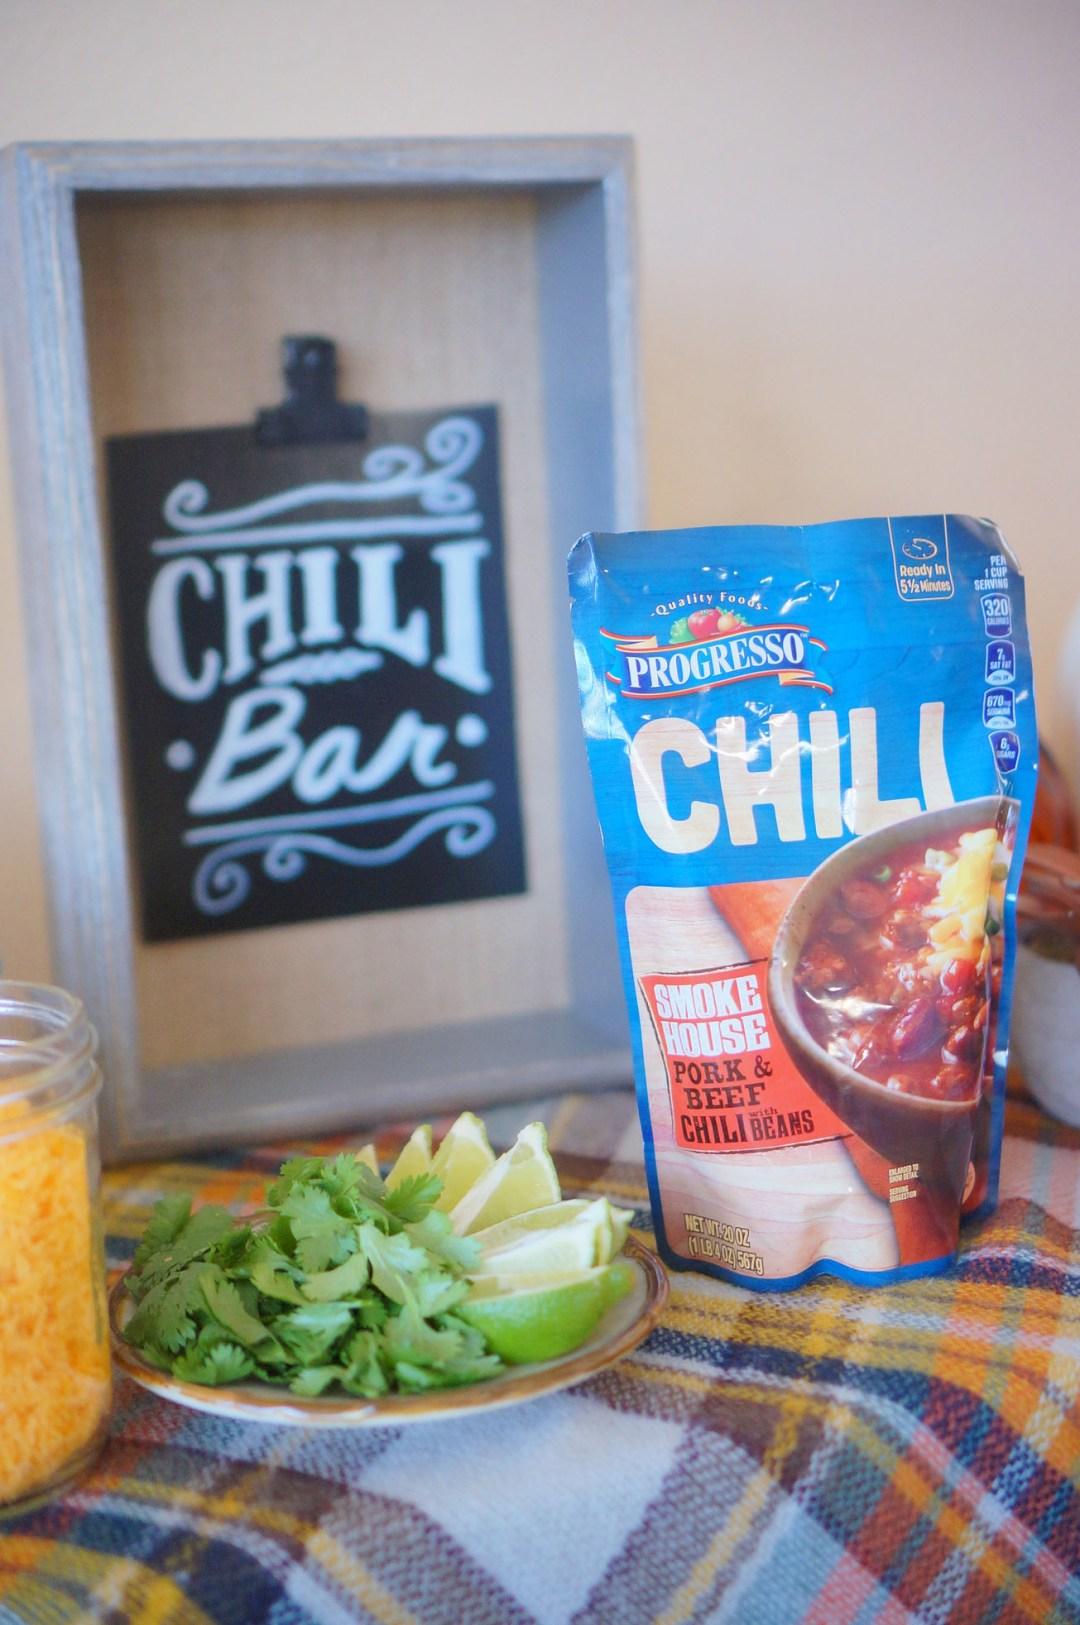 Chili Bar - The February Fox